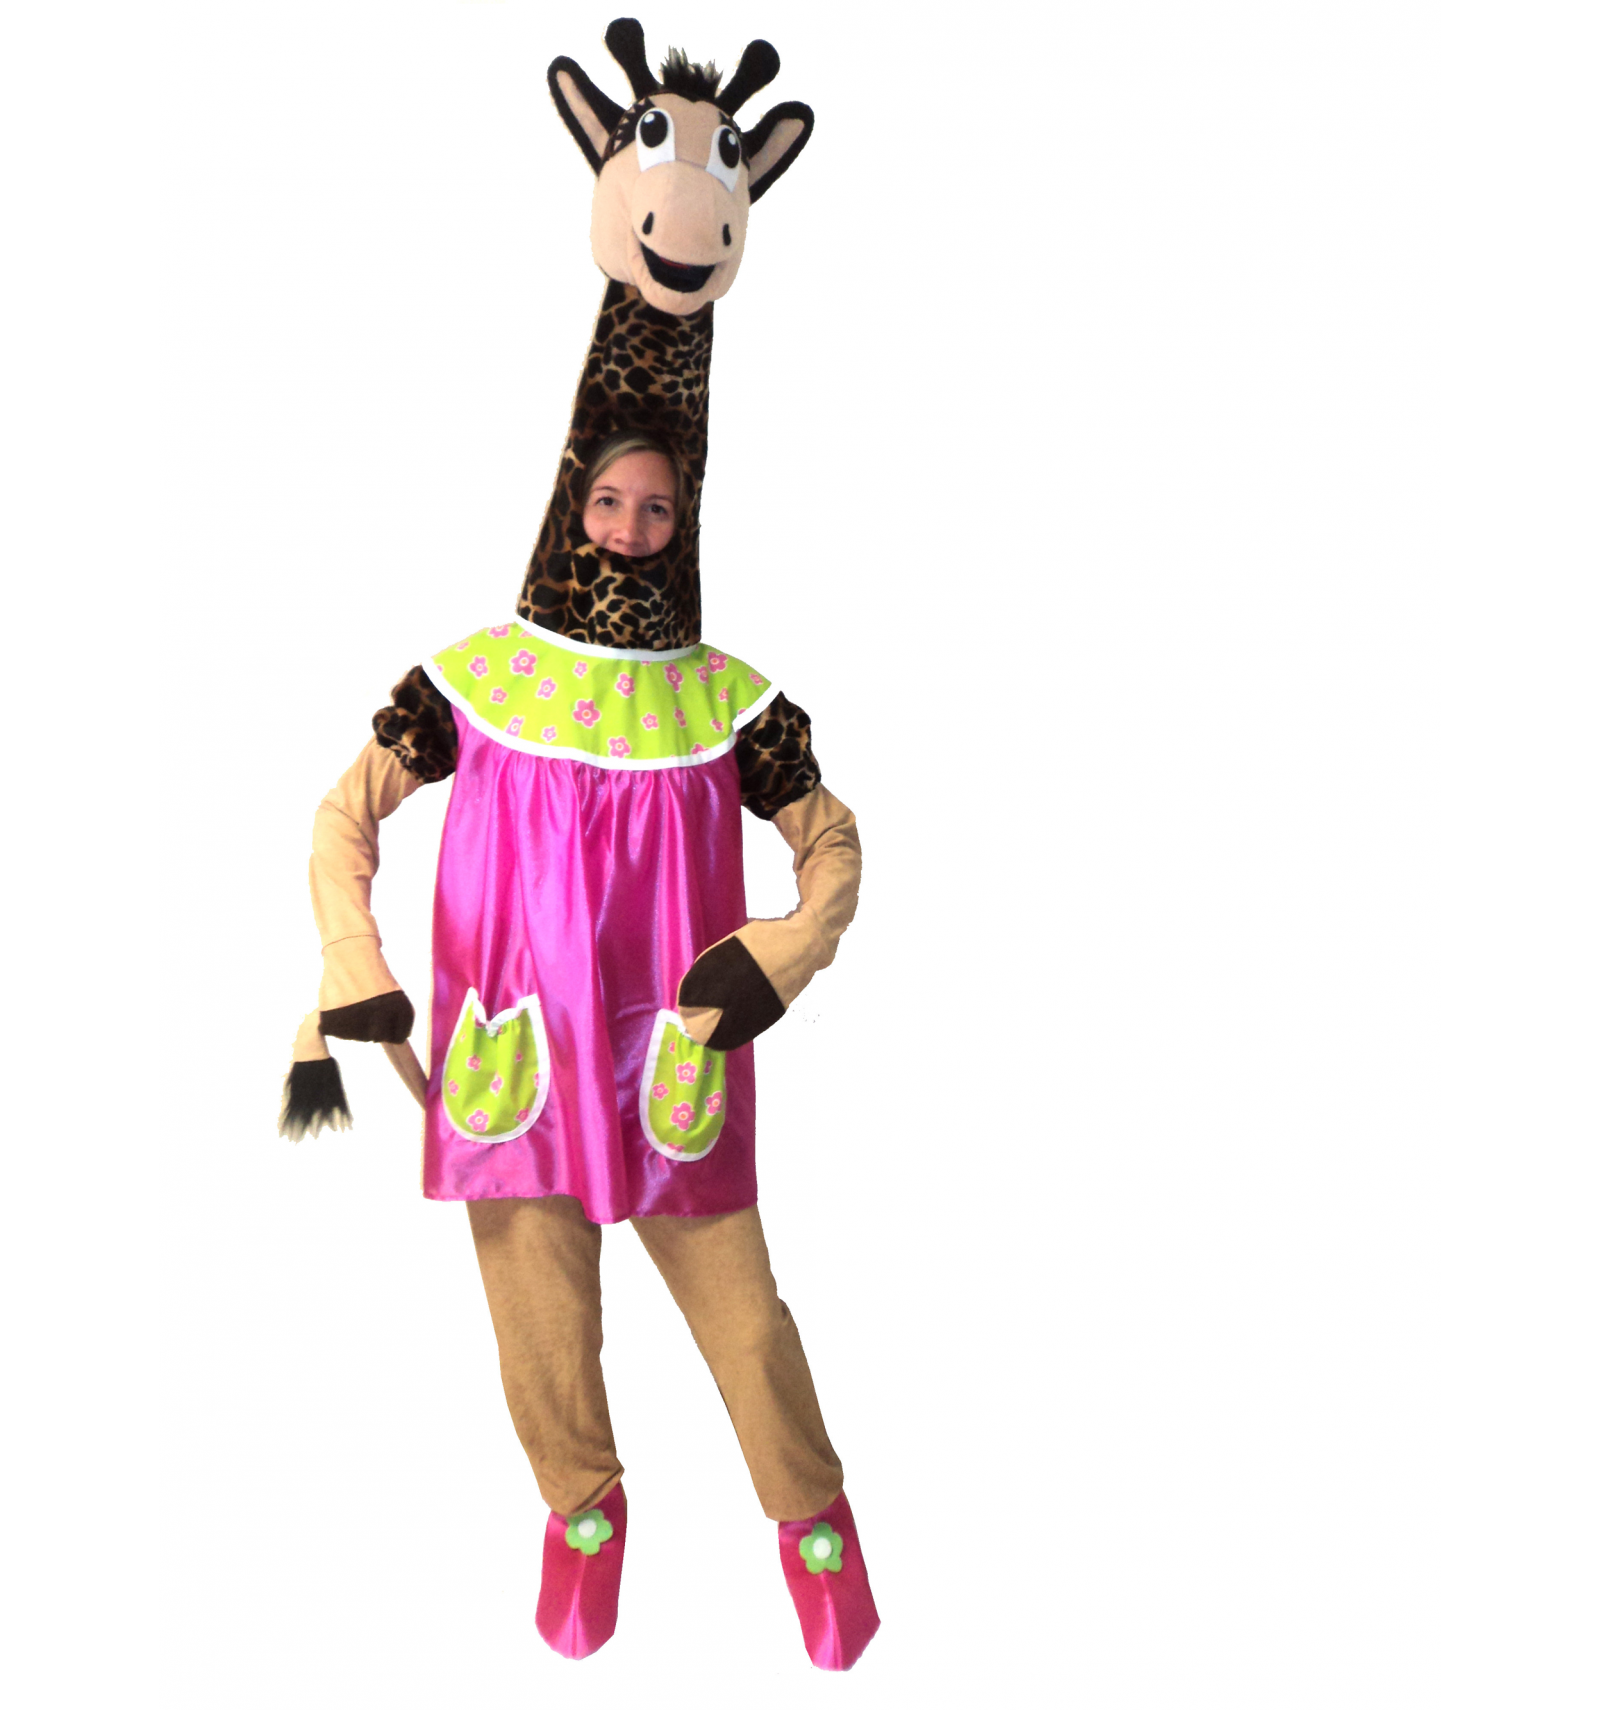 d guisement girafe adulte magasin deguisements offres. Black Bedroom Furniture Sets. Home Design Ideas